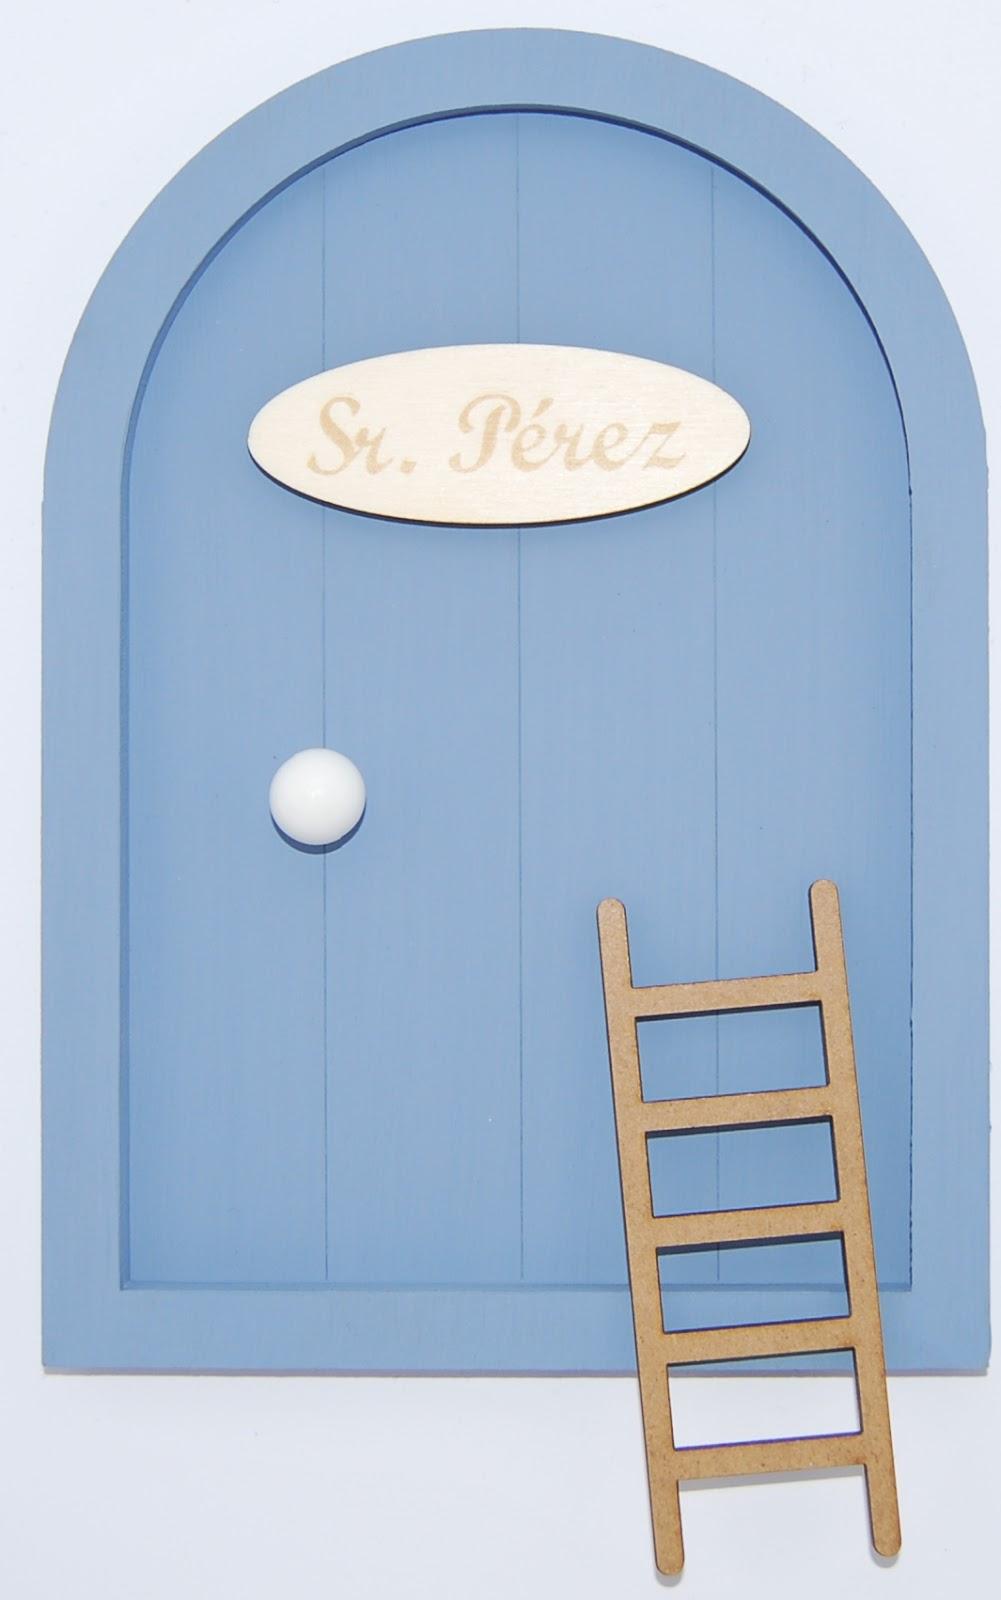 Puertas m gicas del ratoncito p rez evyre for Puerta 4 del jockey